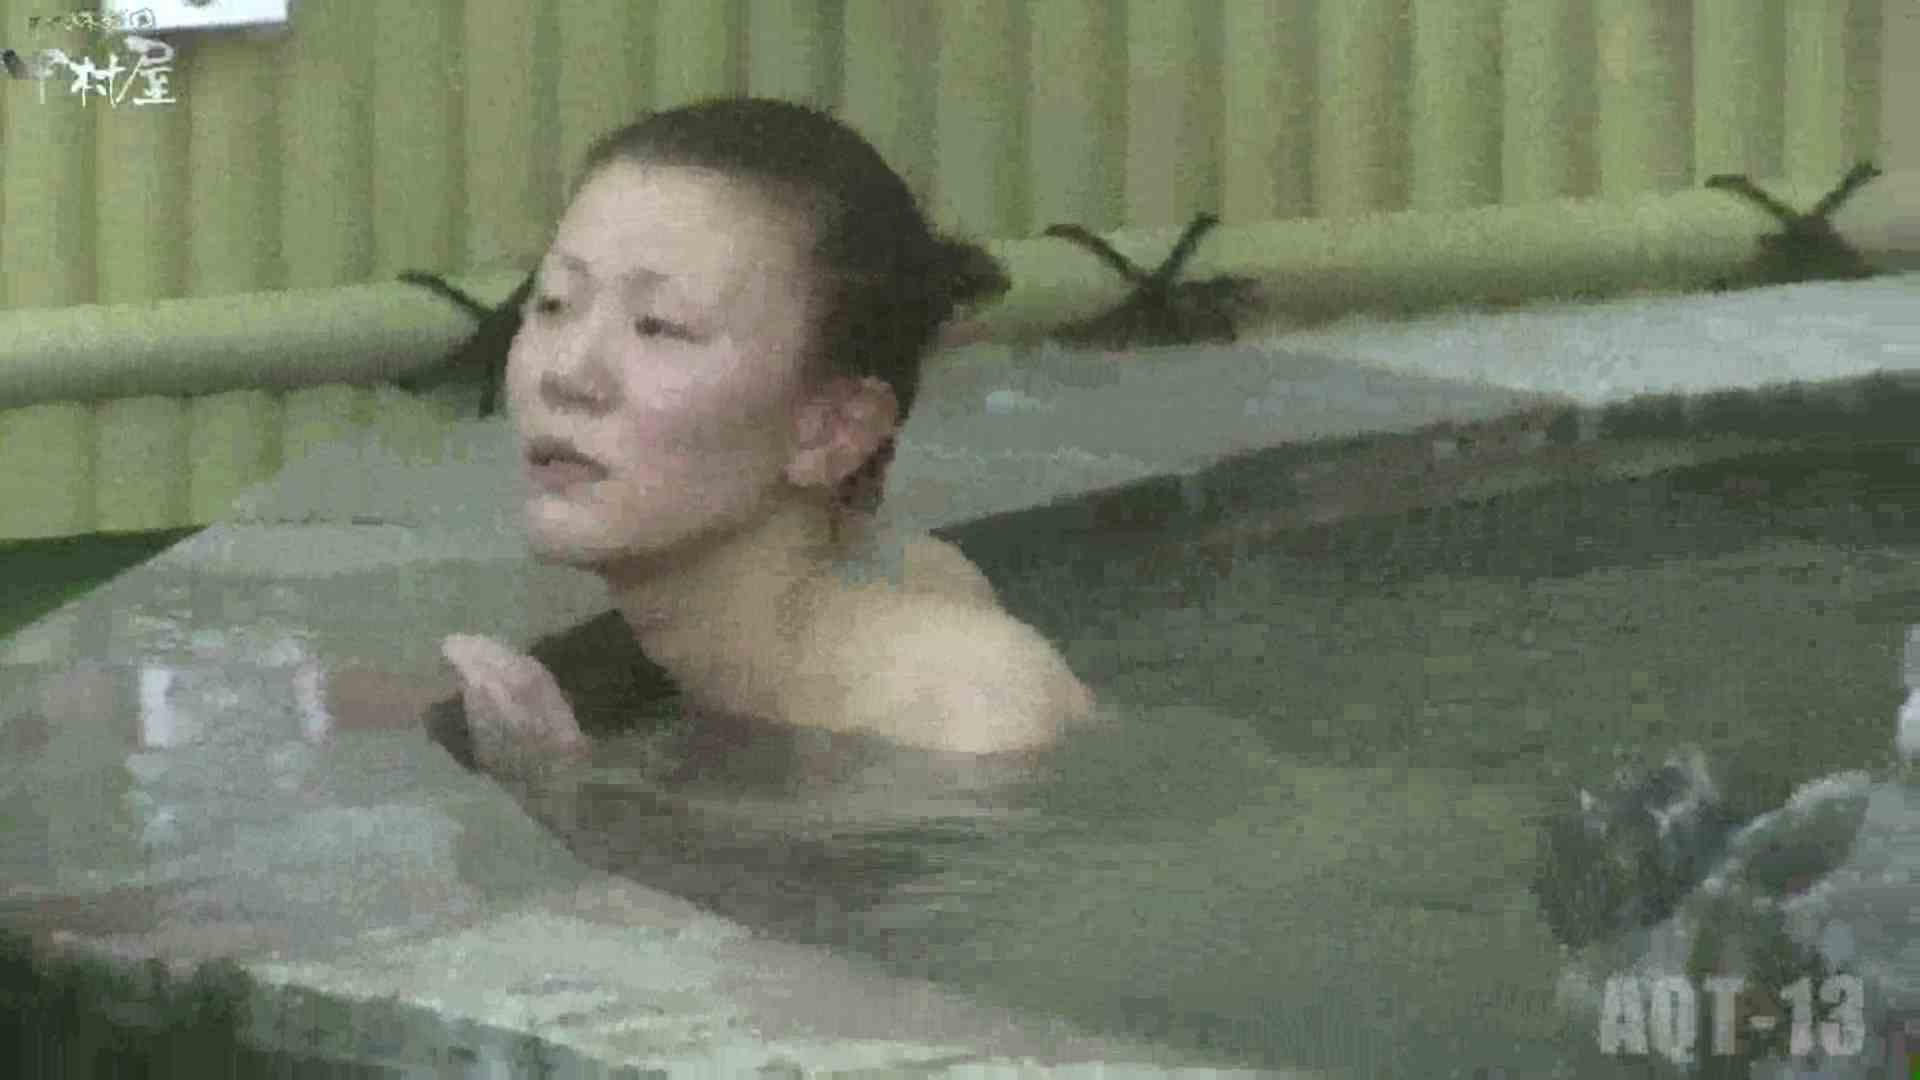 Aquaな露天風呂Vol.877潜入盗撮露天風呂十三判湯 其の四 OLエロ画像 盗撮おめこ無修正動画無料 26PICs 2